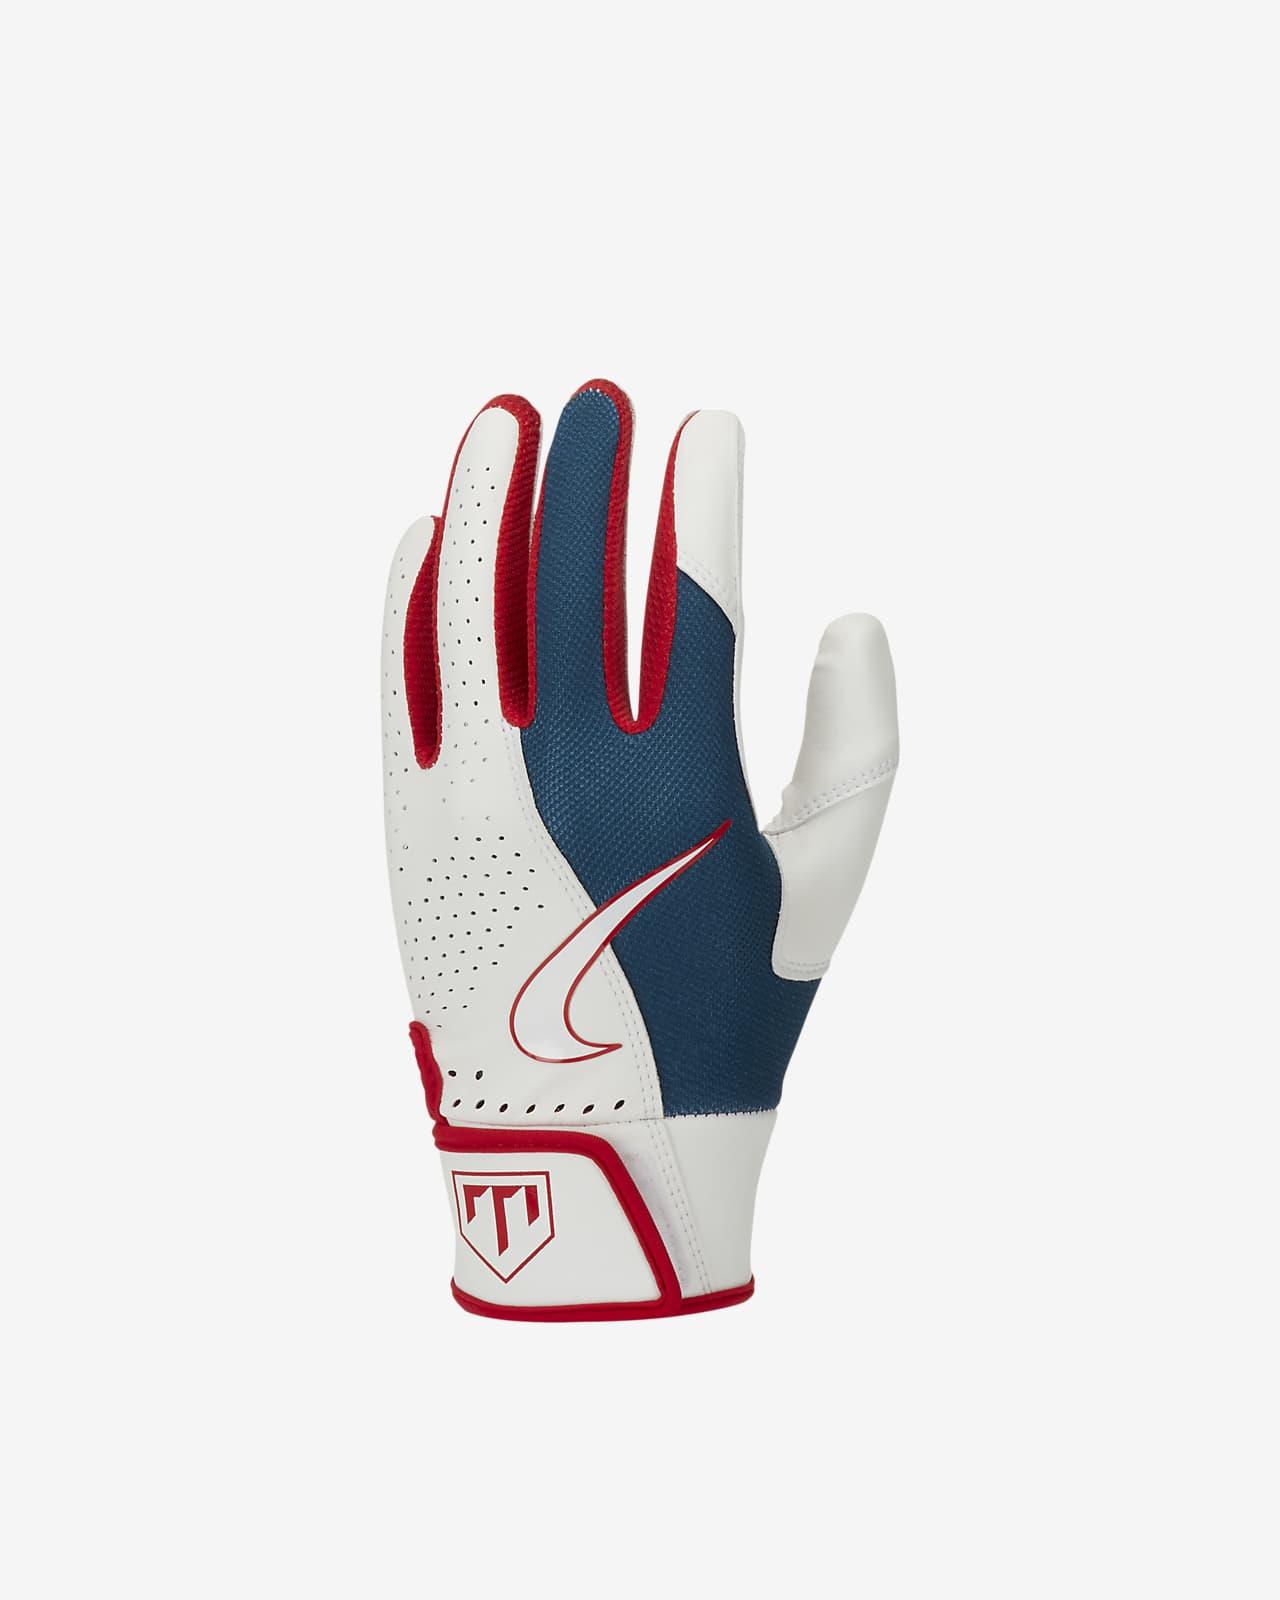 Nike Trout Edge 2.0 Kids' Baseball Batting Gloves